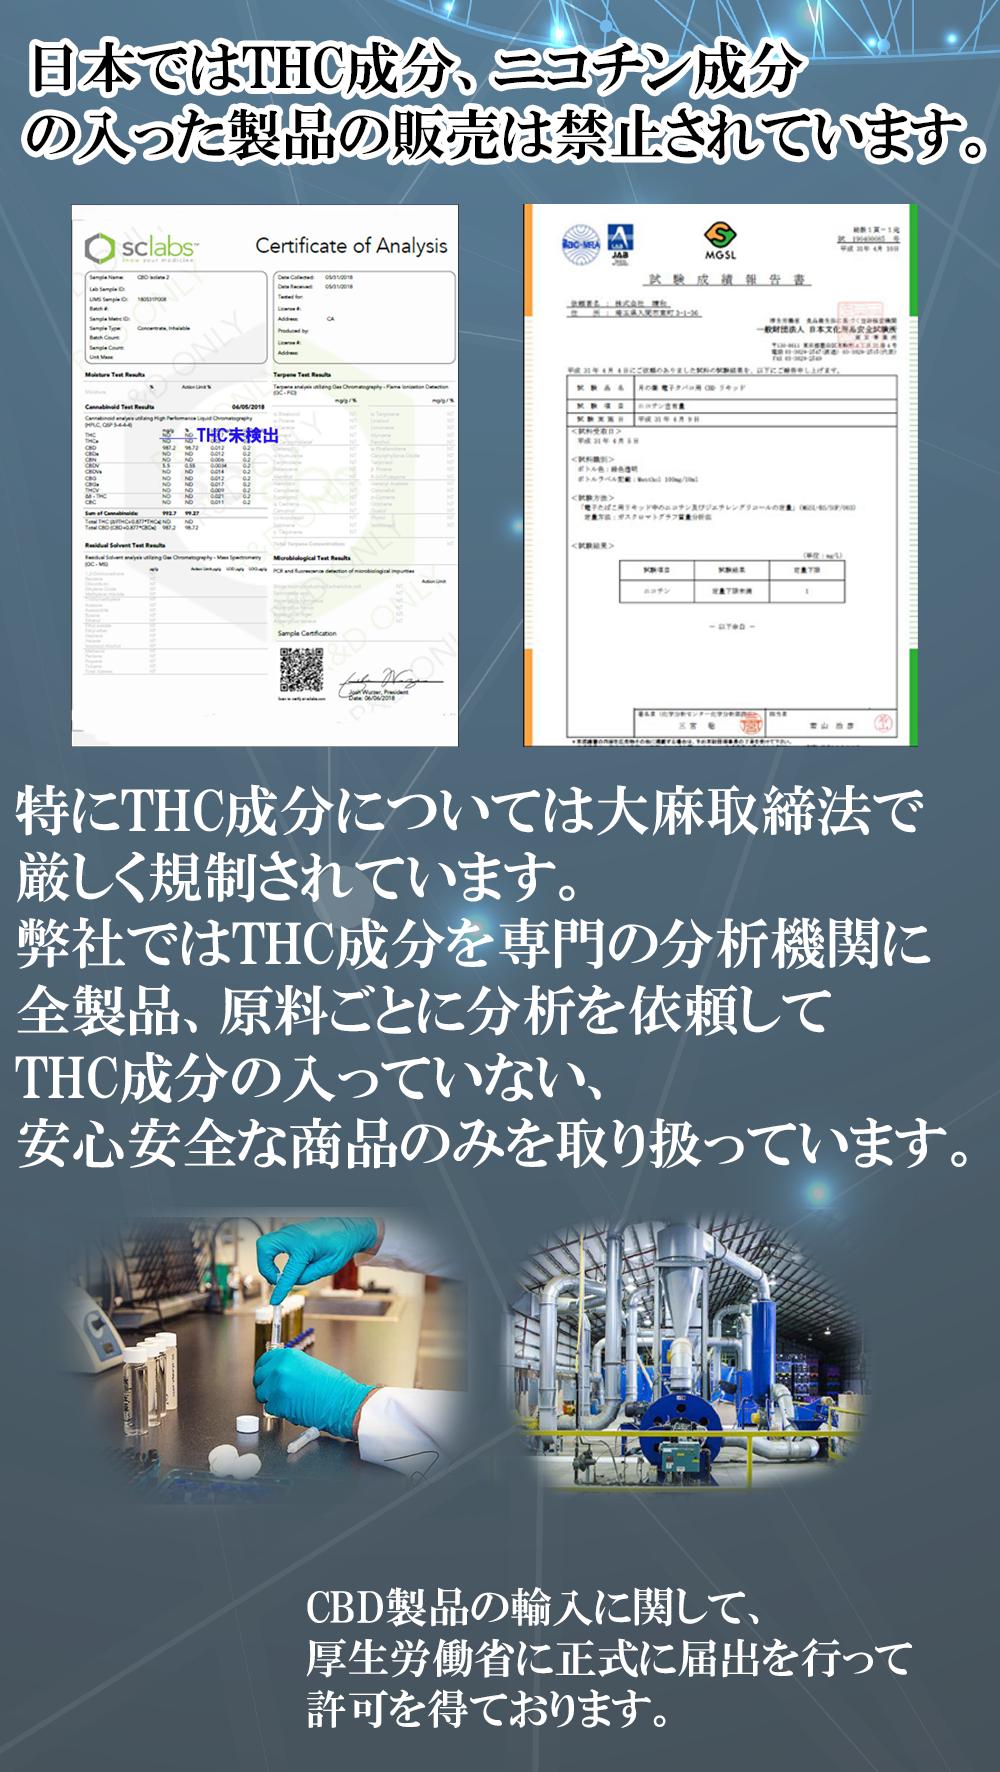 THC成分を専門の分析機関に全製品、原料ごとに分析を依頼してTHC成分の入っていない、安心安全な商品のみを取り扱っています。